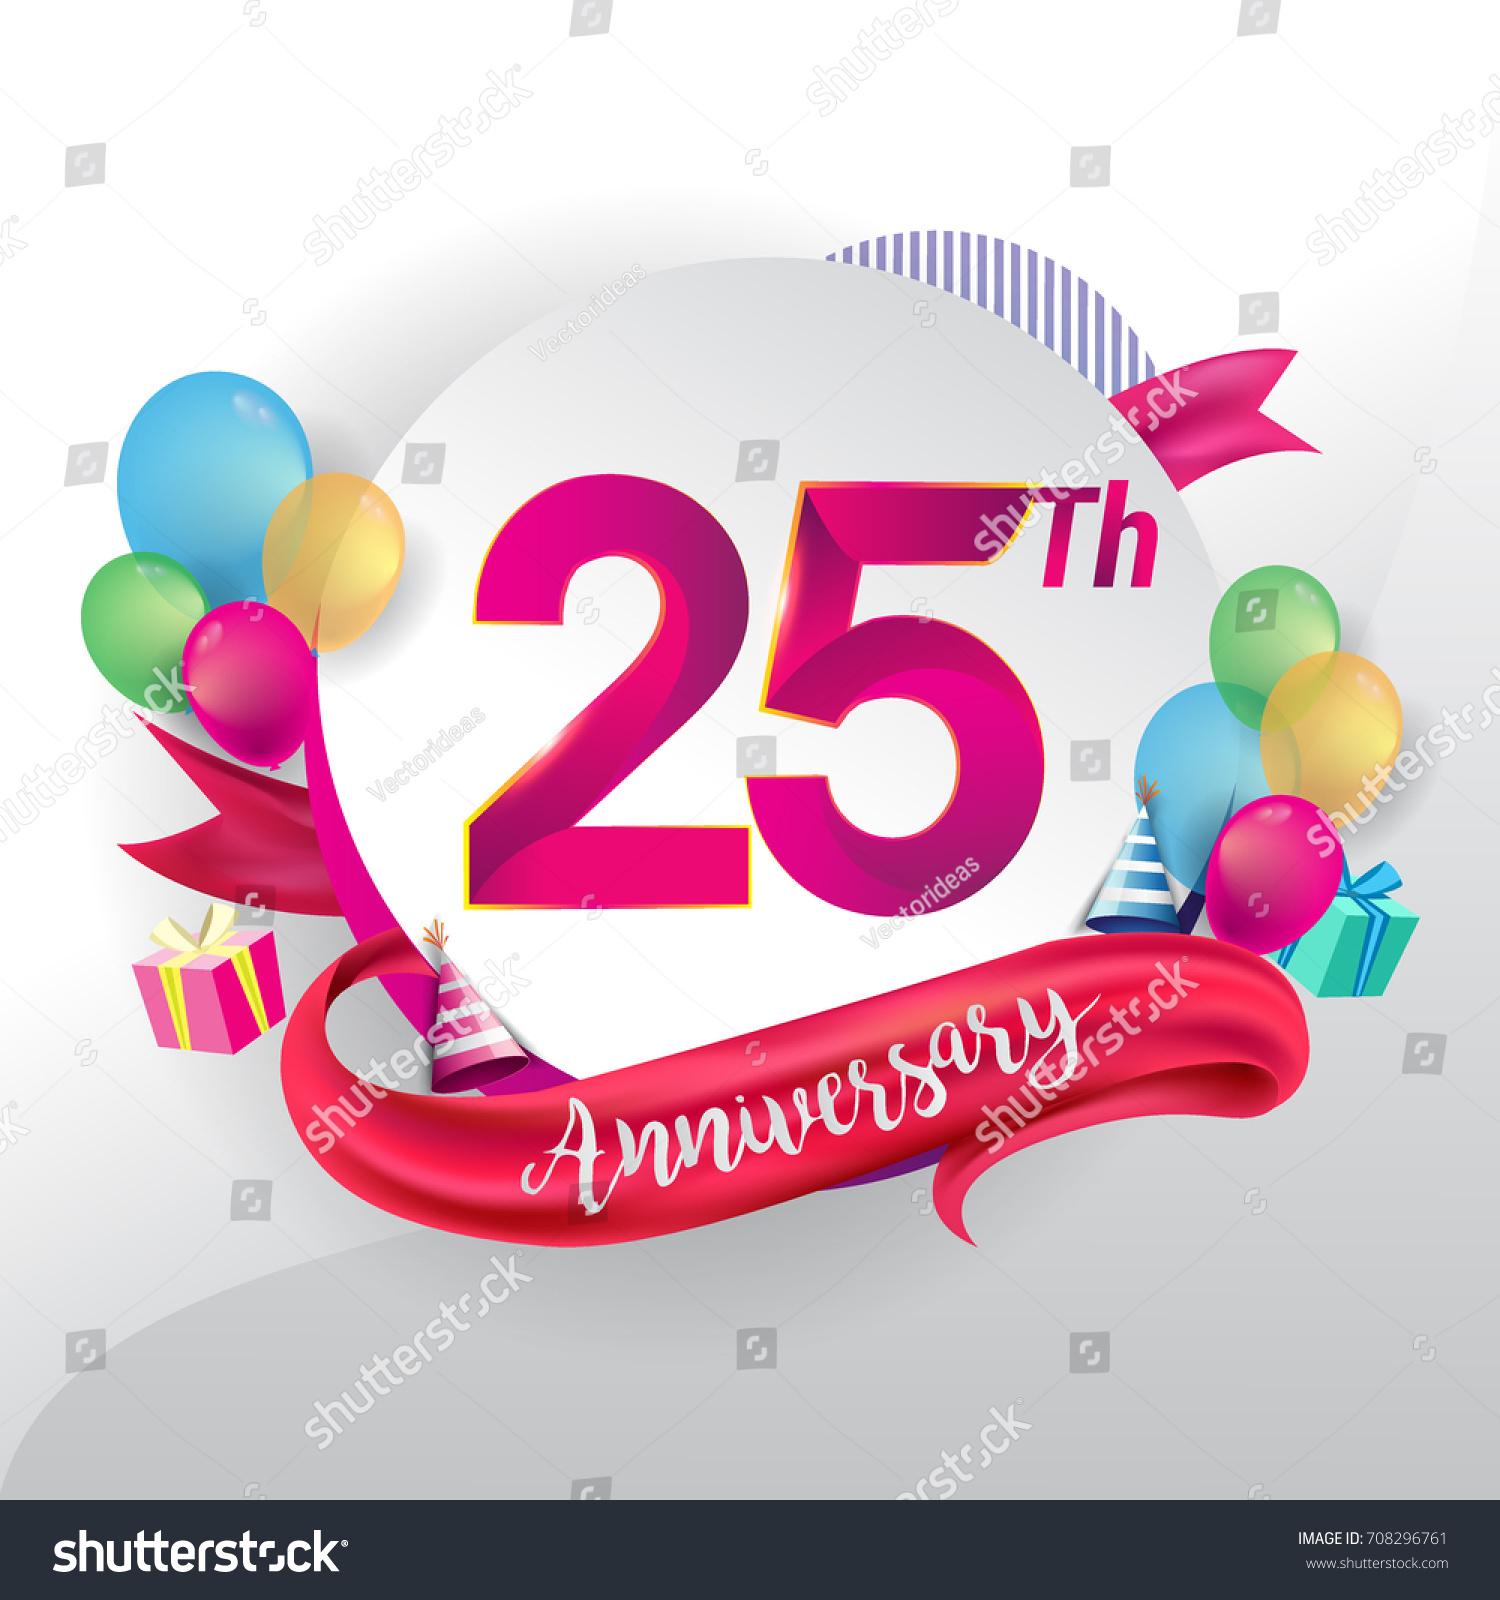 25th Anniversary Logo Ribbon Balloon Gift Stock Vector 708296761 ...